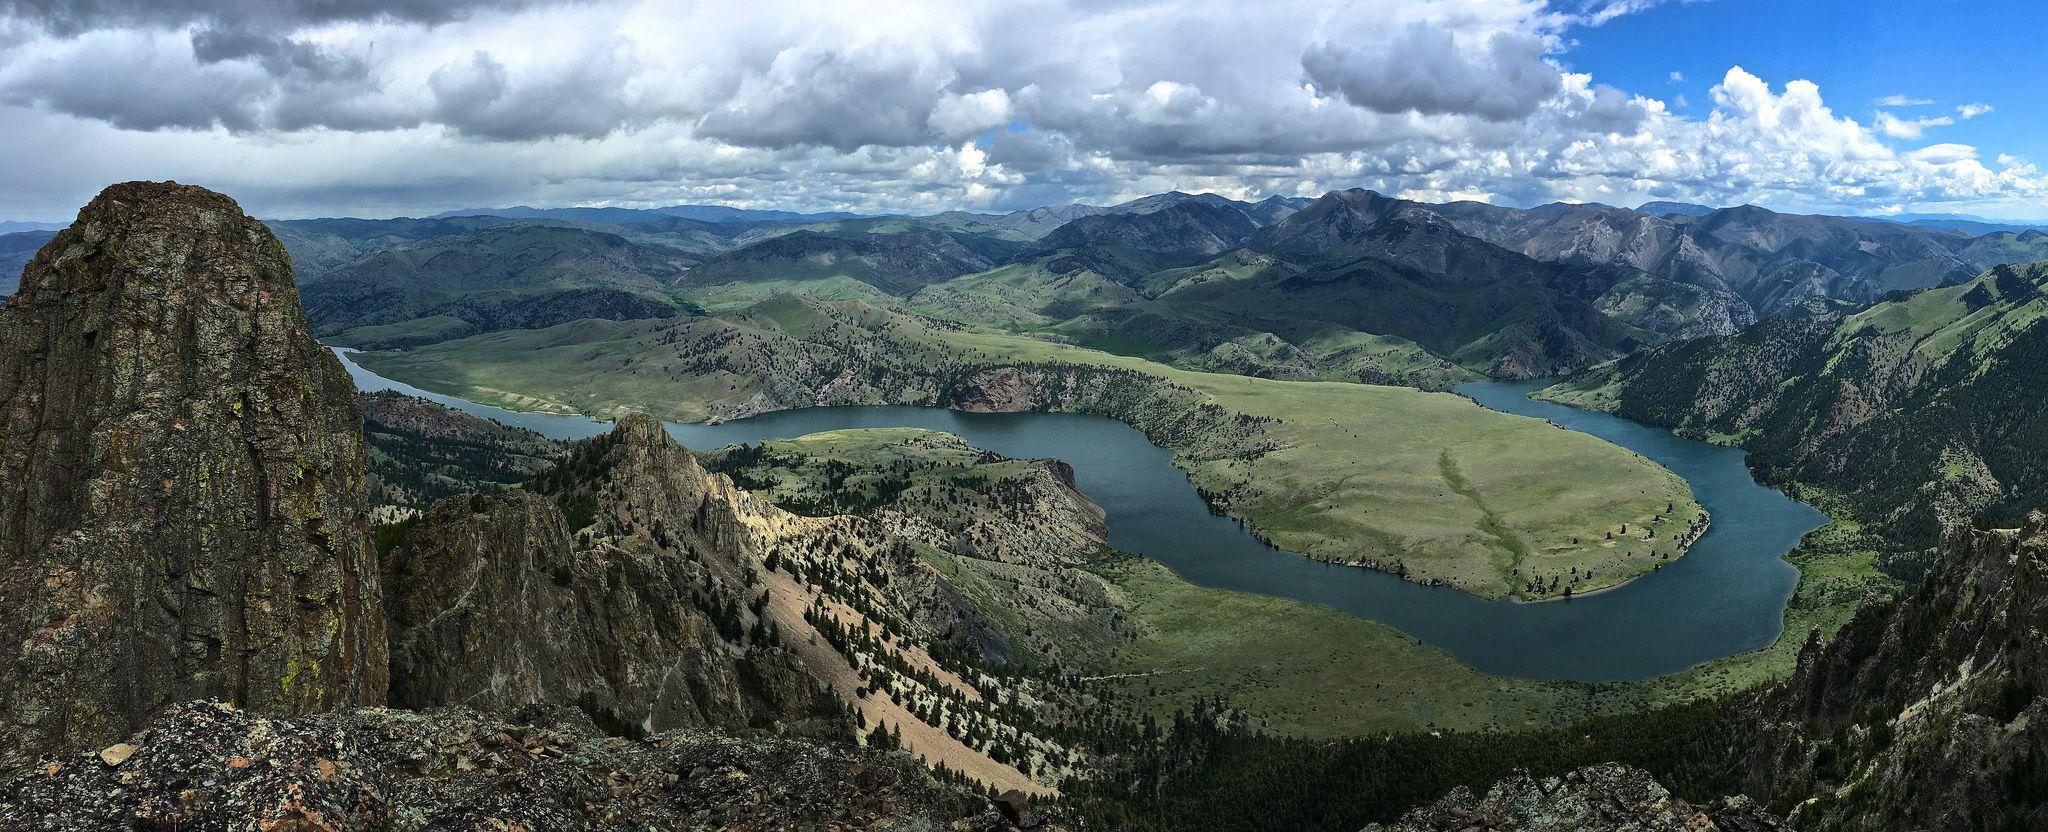 Hike to the sleeping giant hiking natural landmarks